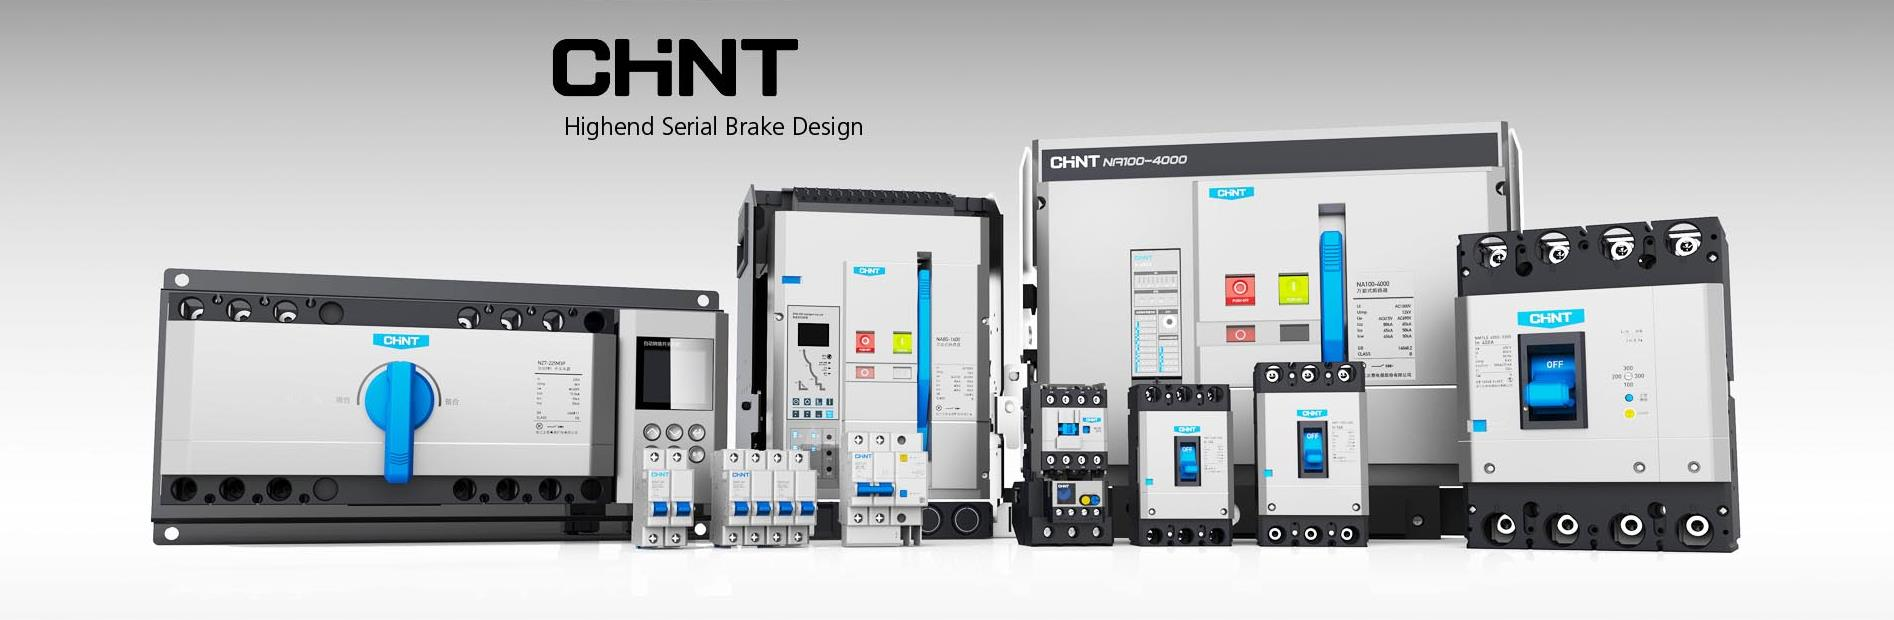 CHINT serial brake design  正泰低压断路器系列设计